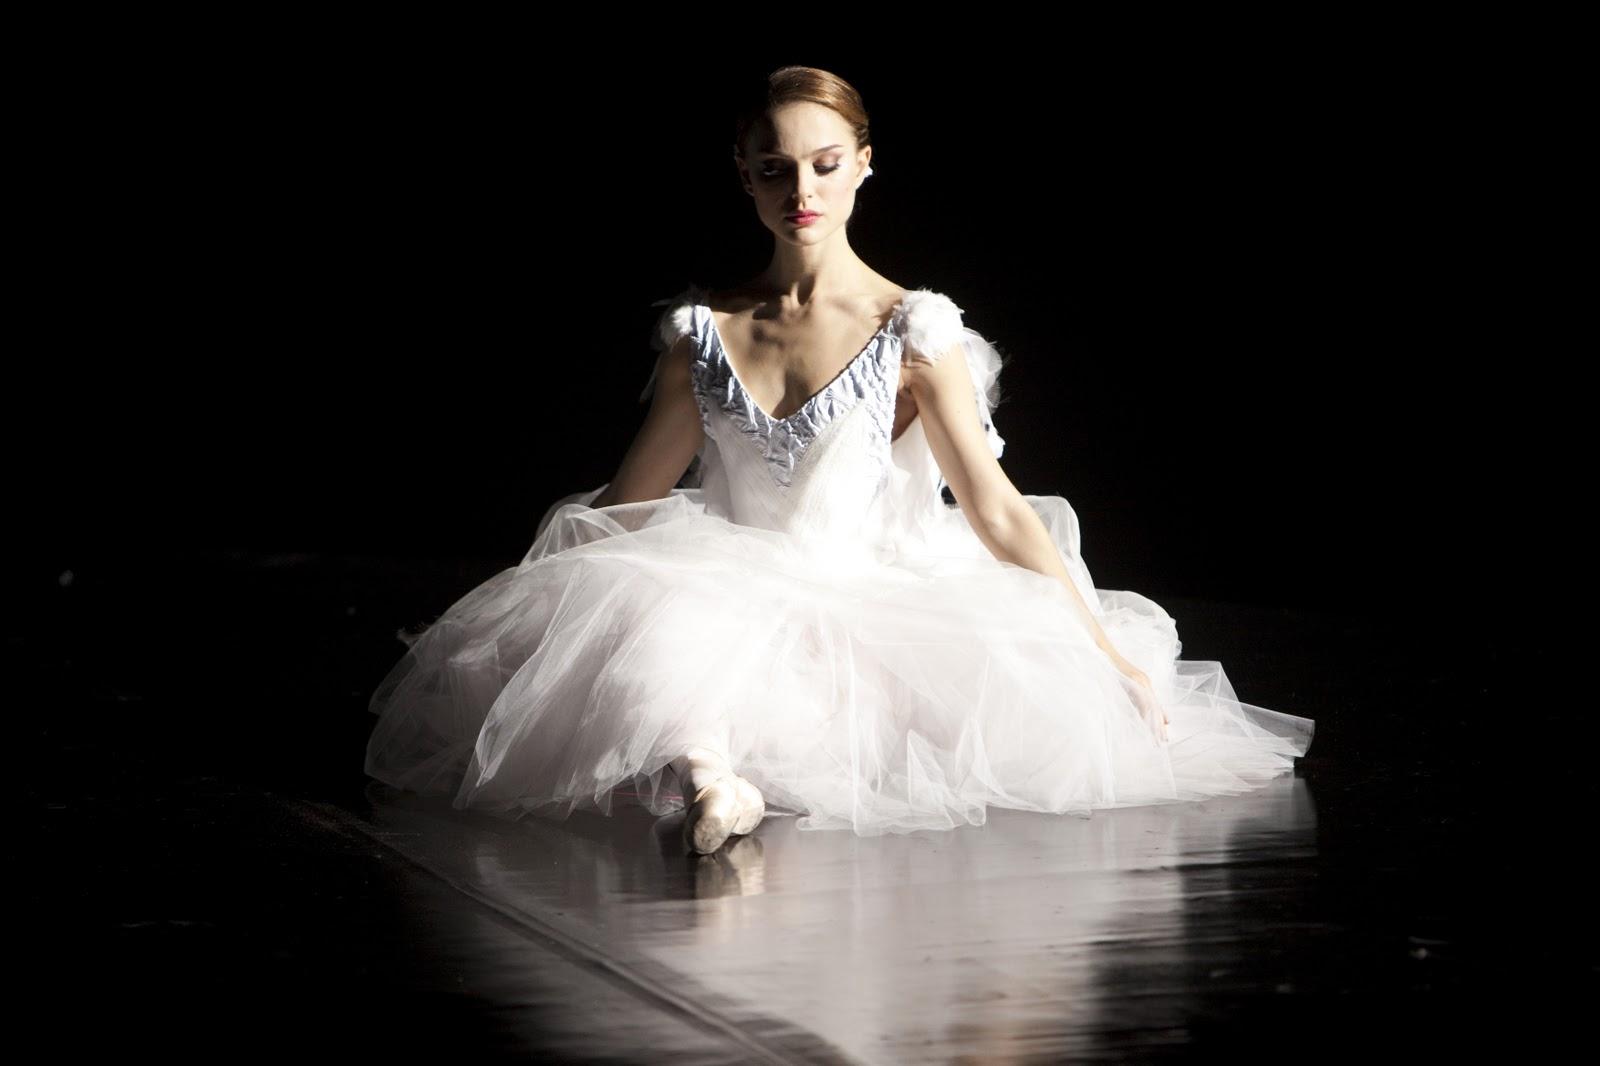 http://4.bp.blogspot.com/-8qhF4B-wyHQ/TWXBQU6g9ZI/AAAAAAAAATY/atiBHx7h2-w/s1600/black_swan_white.jpg